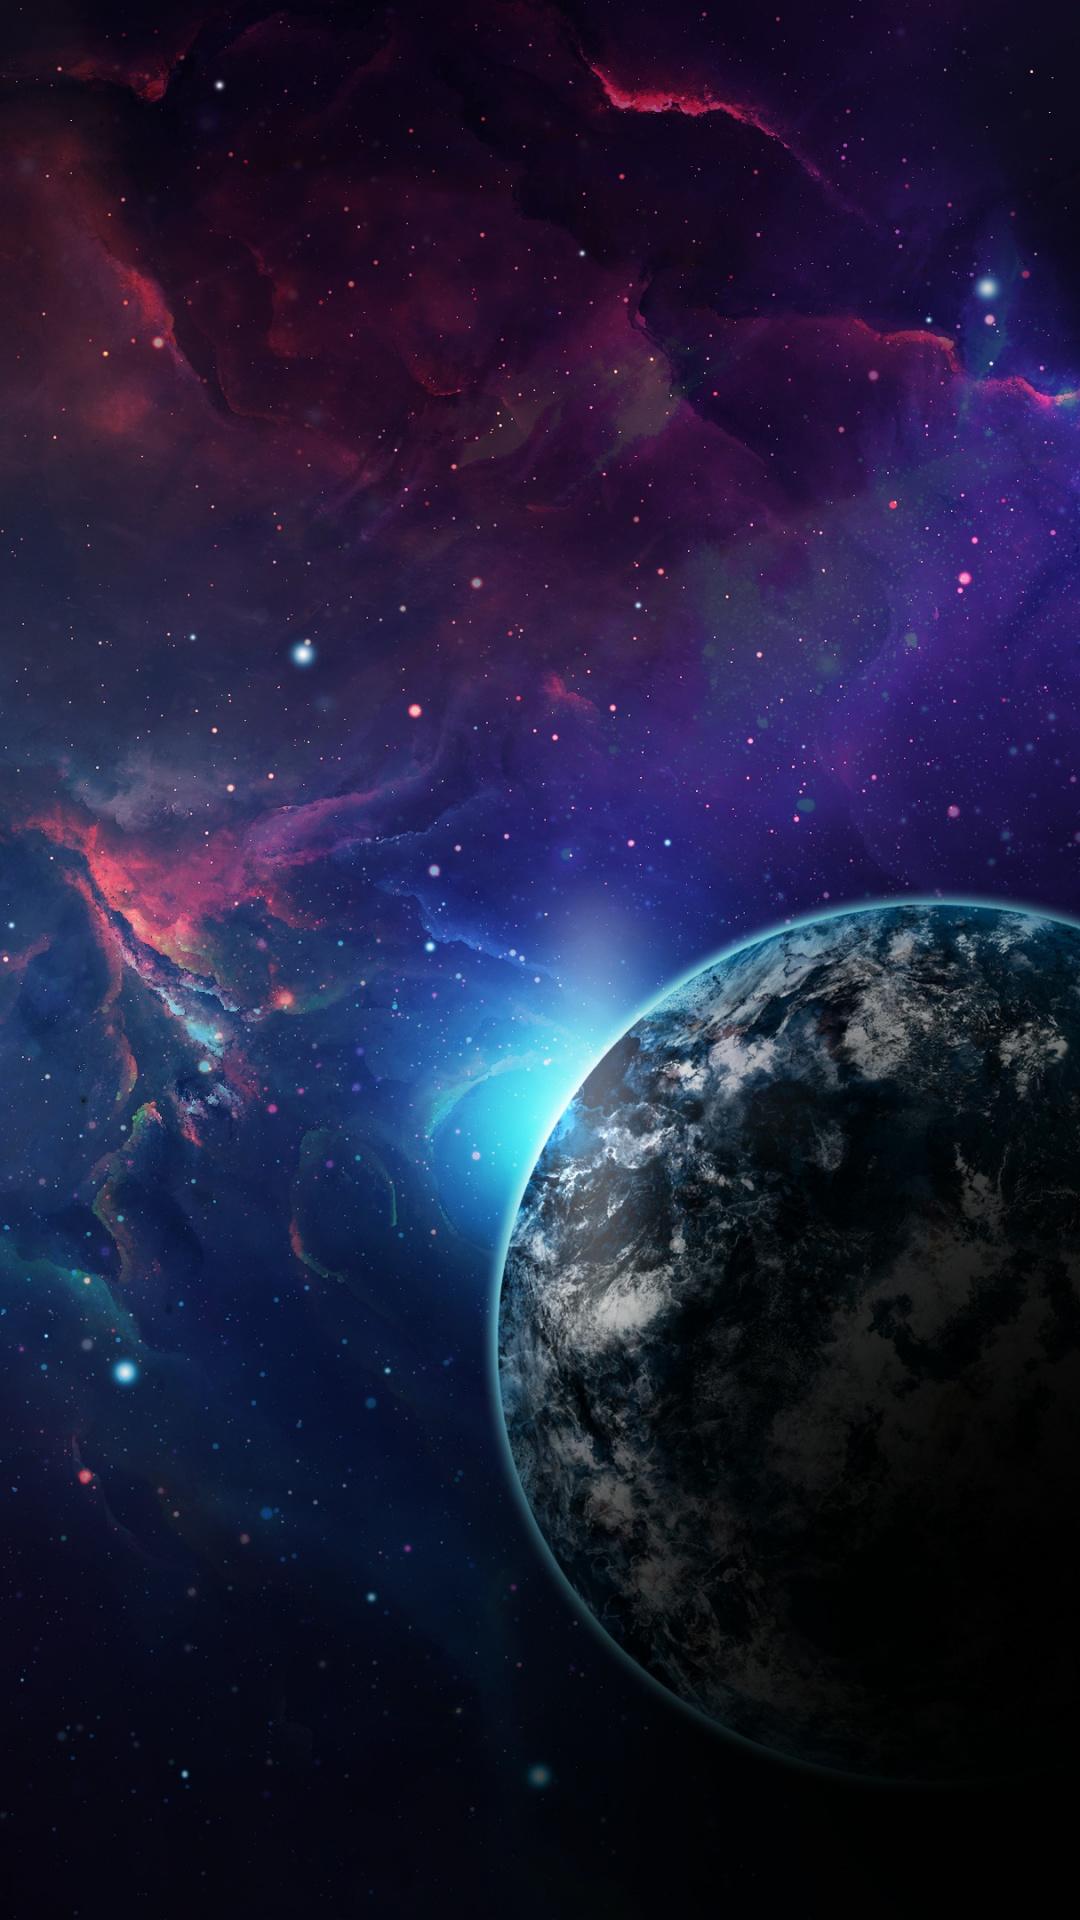 planet galaxy earth space nebula wallpaper in resolution sfondi iphone hd 4k 1080x1920 download hd wallpaper wallpapertip planet galaxy earth space nebula